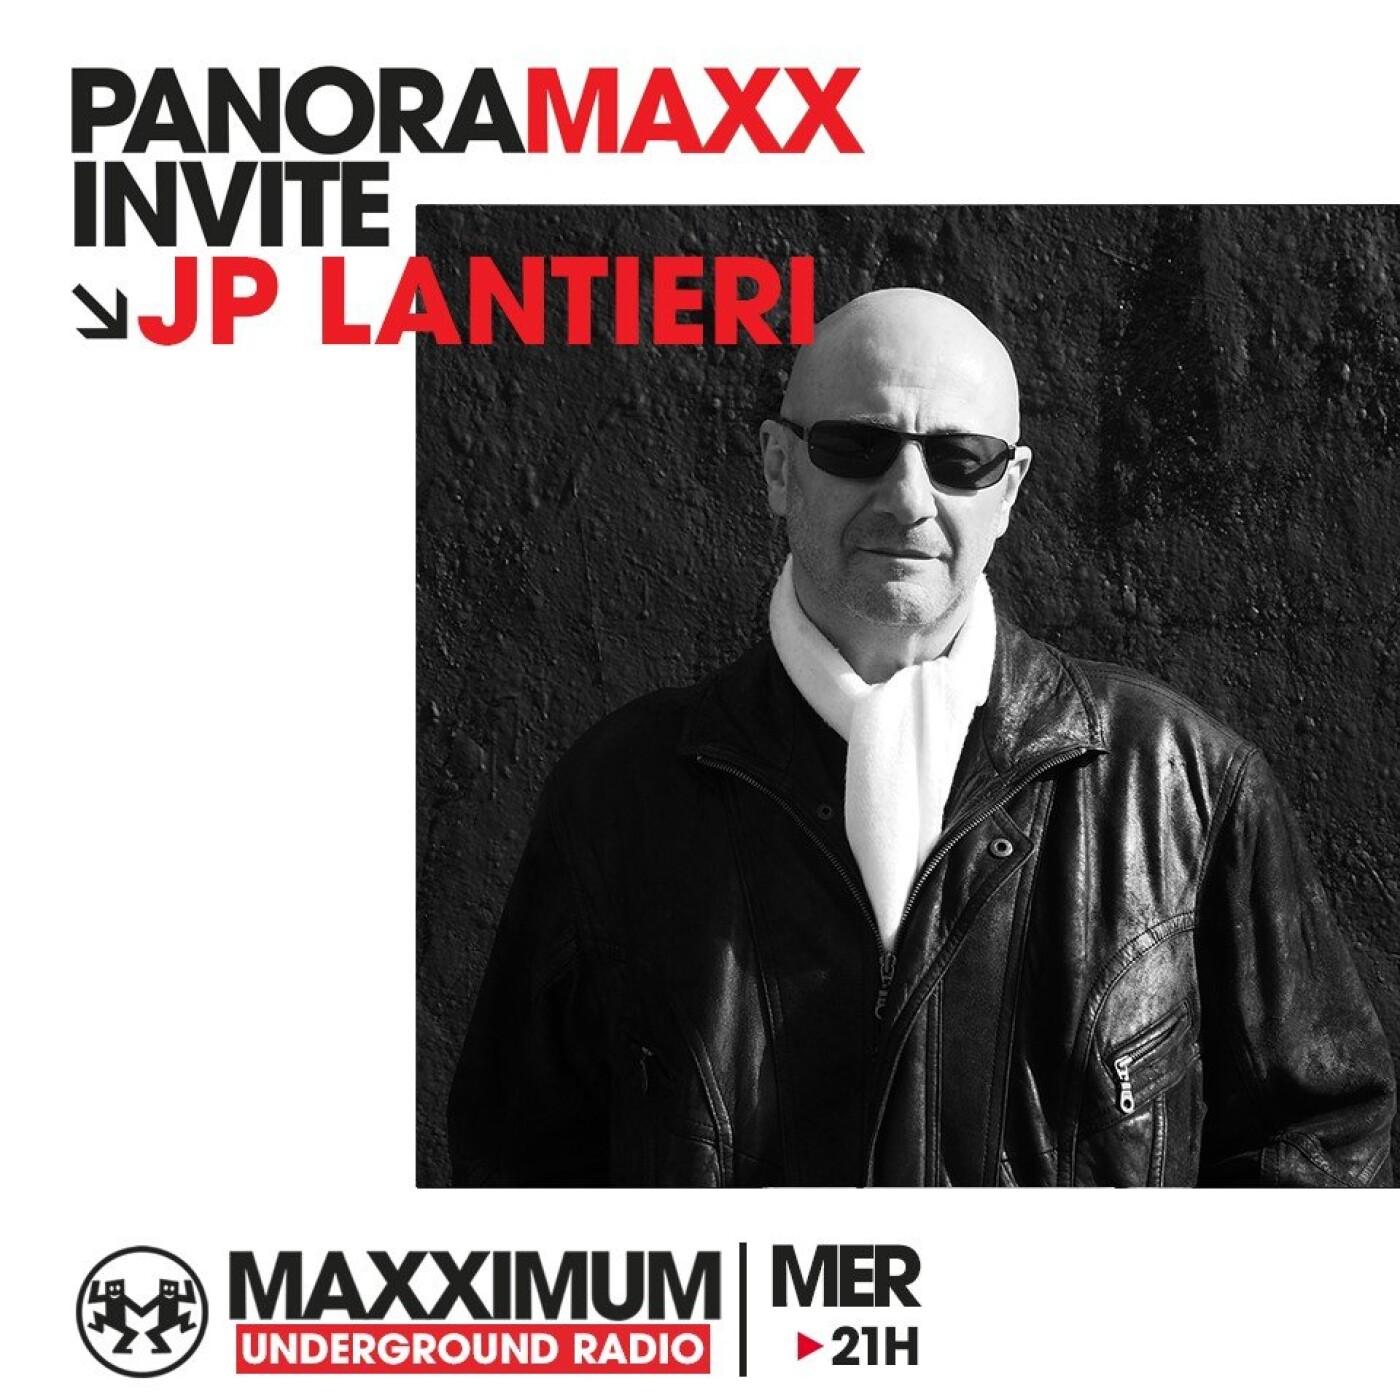 PANORAMAXX : JP LANTIERI